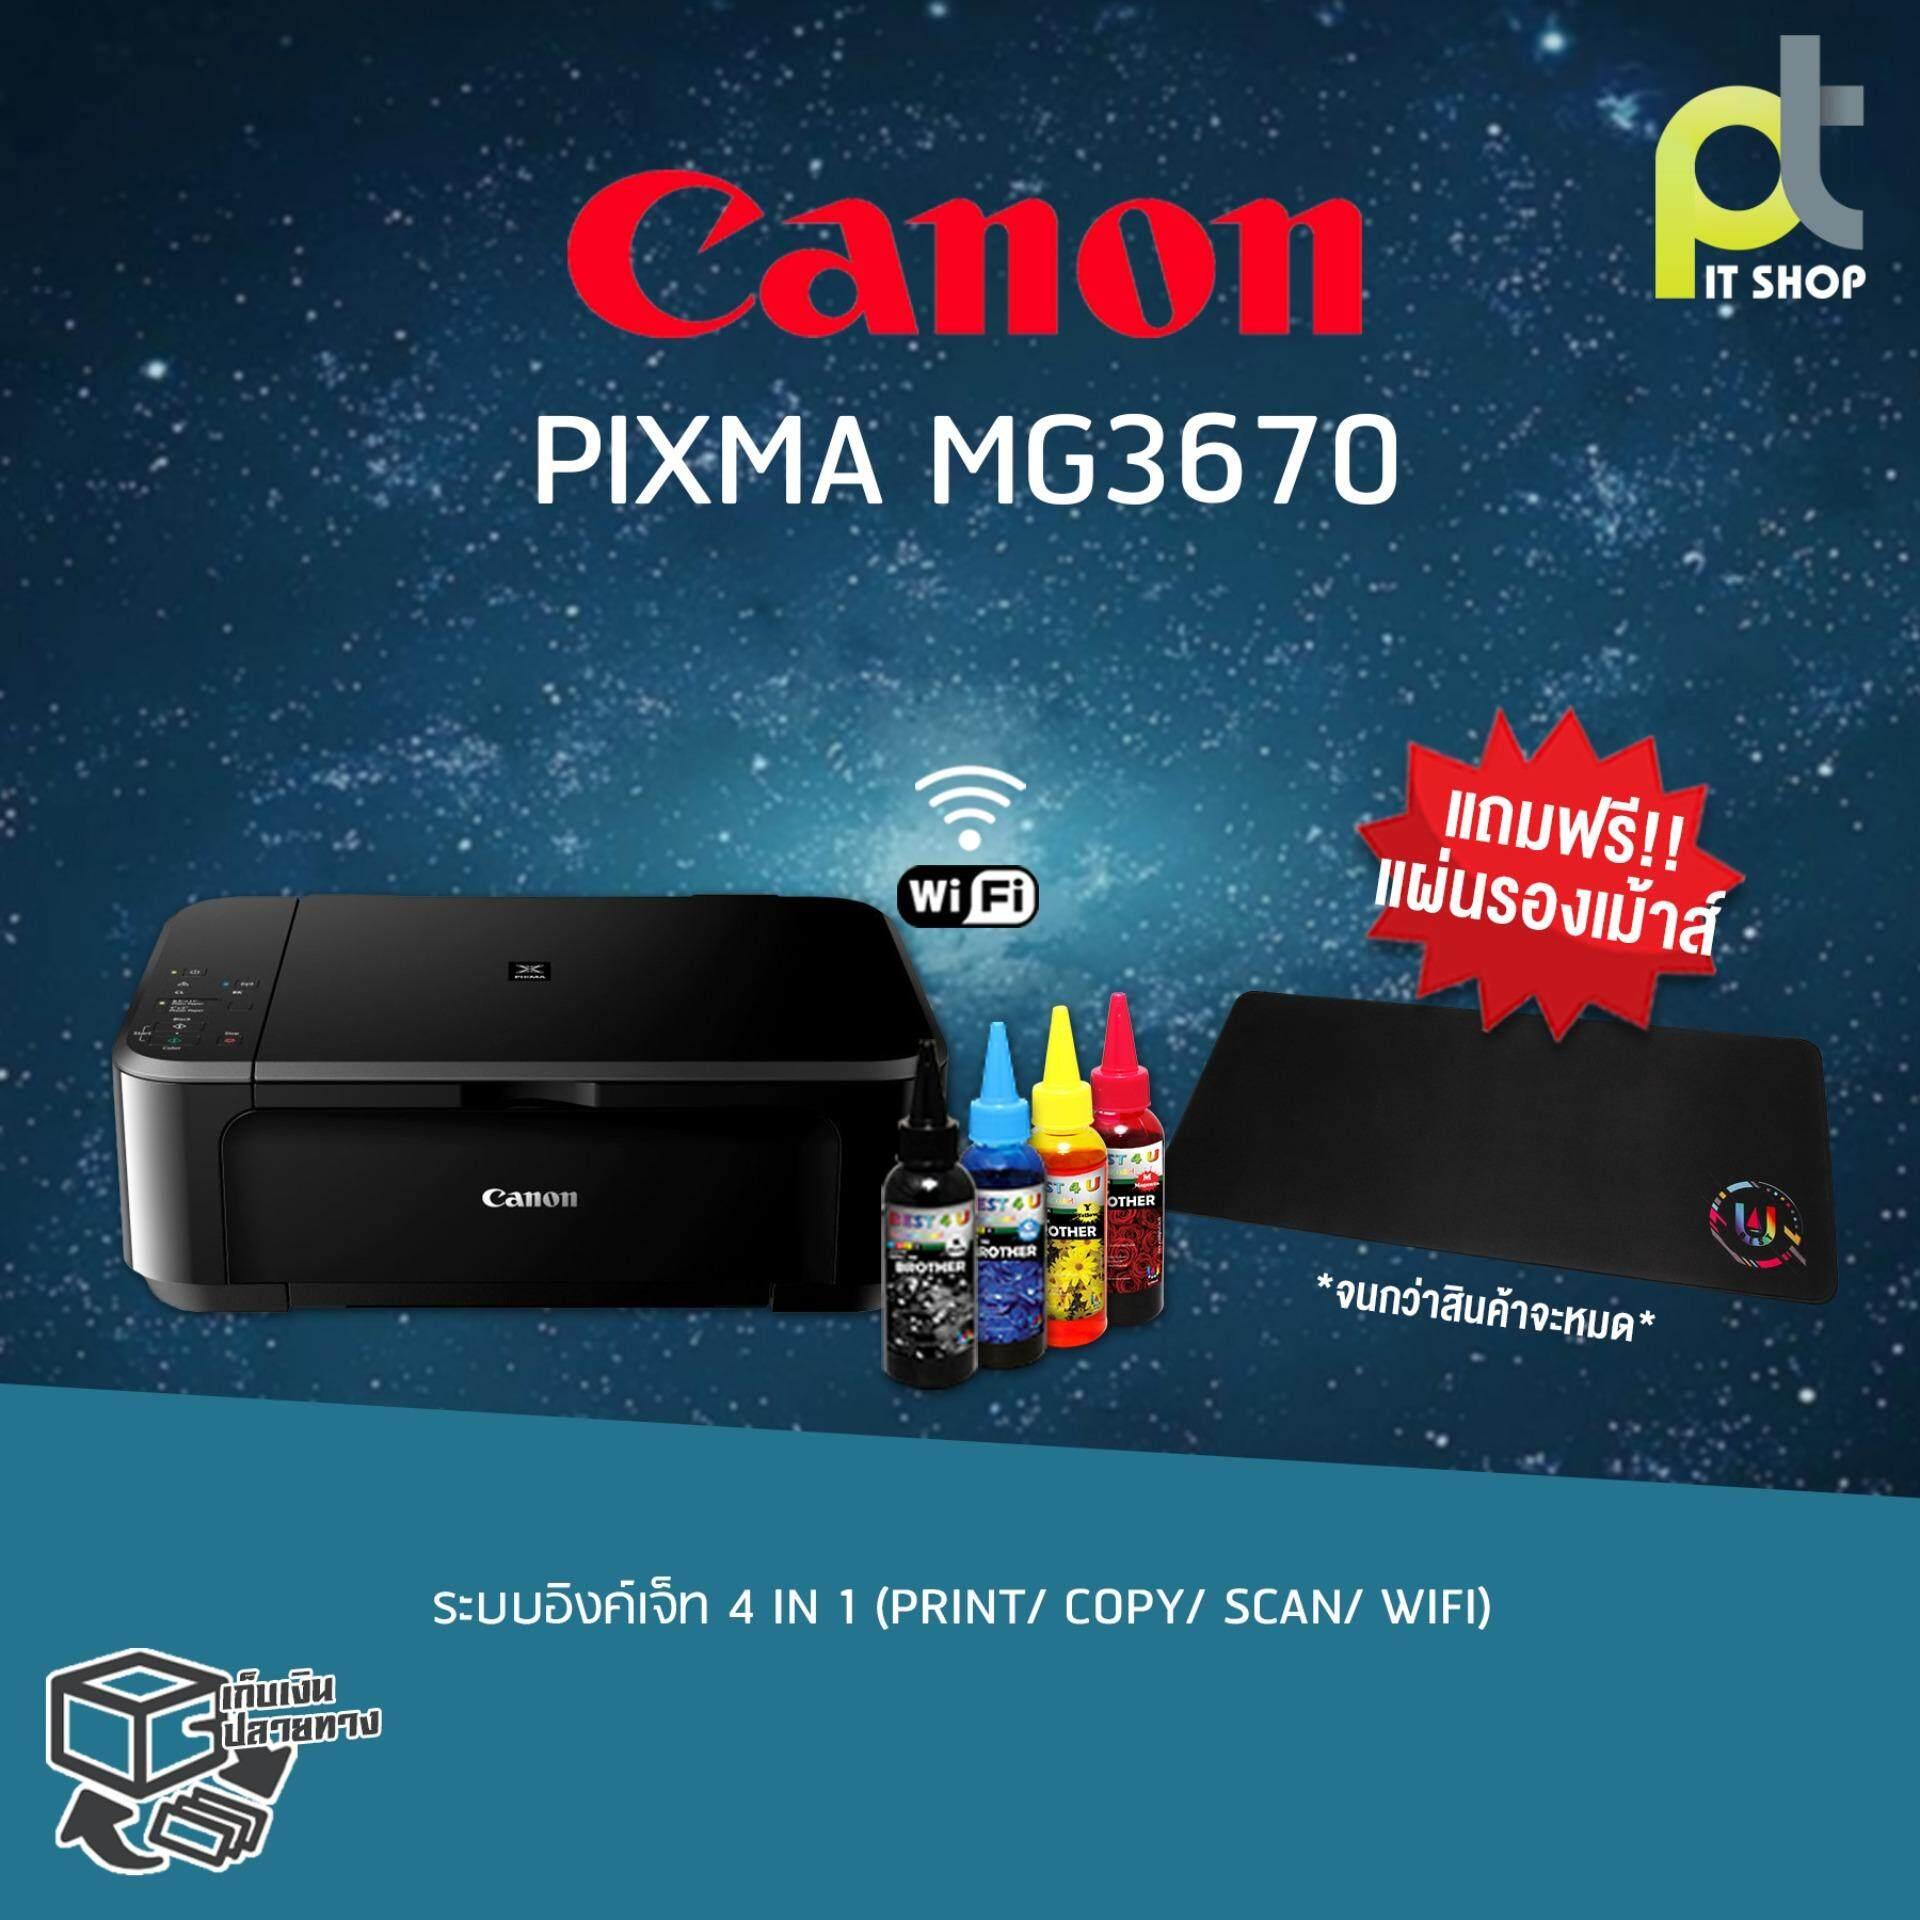 Jual Canon Wifi Printer Scanner Pixma Mg3670 Electronics Computer Jam Tangan Qampampq Vr 42 Rubber Oranye Original Ink Jet Thailand Black Inkjet